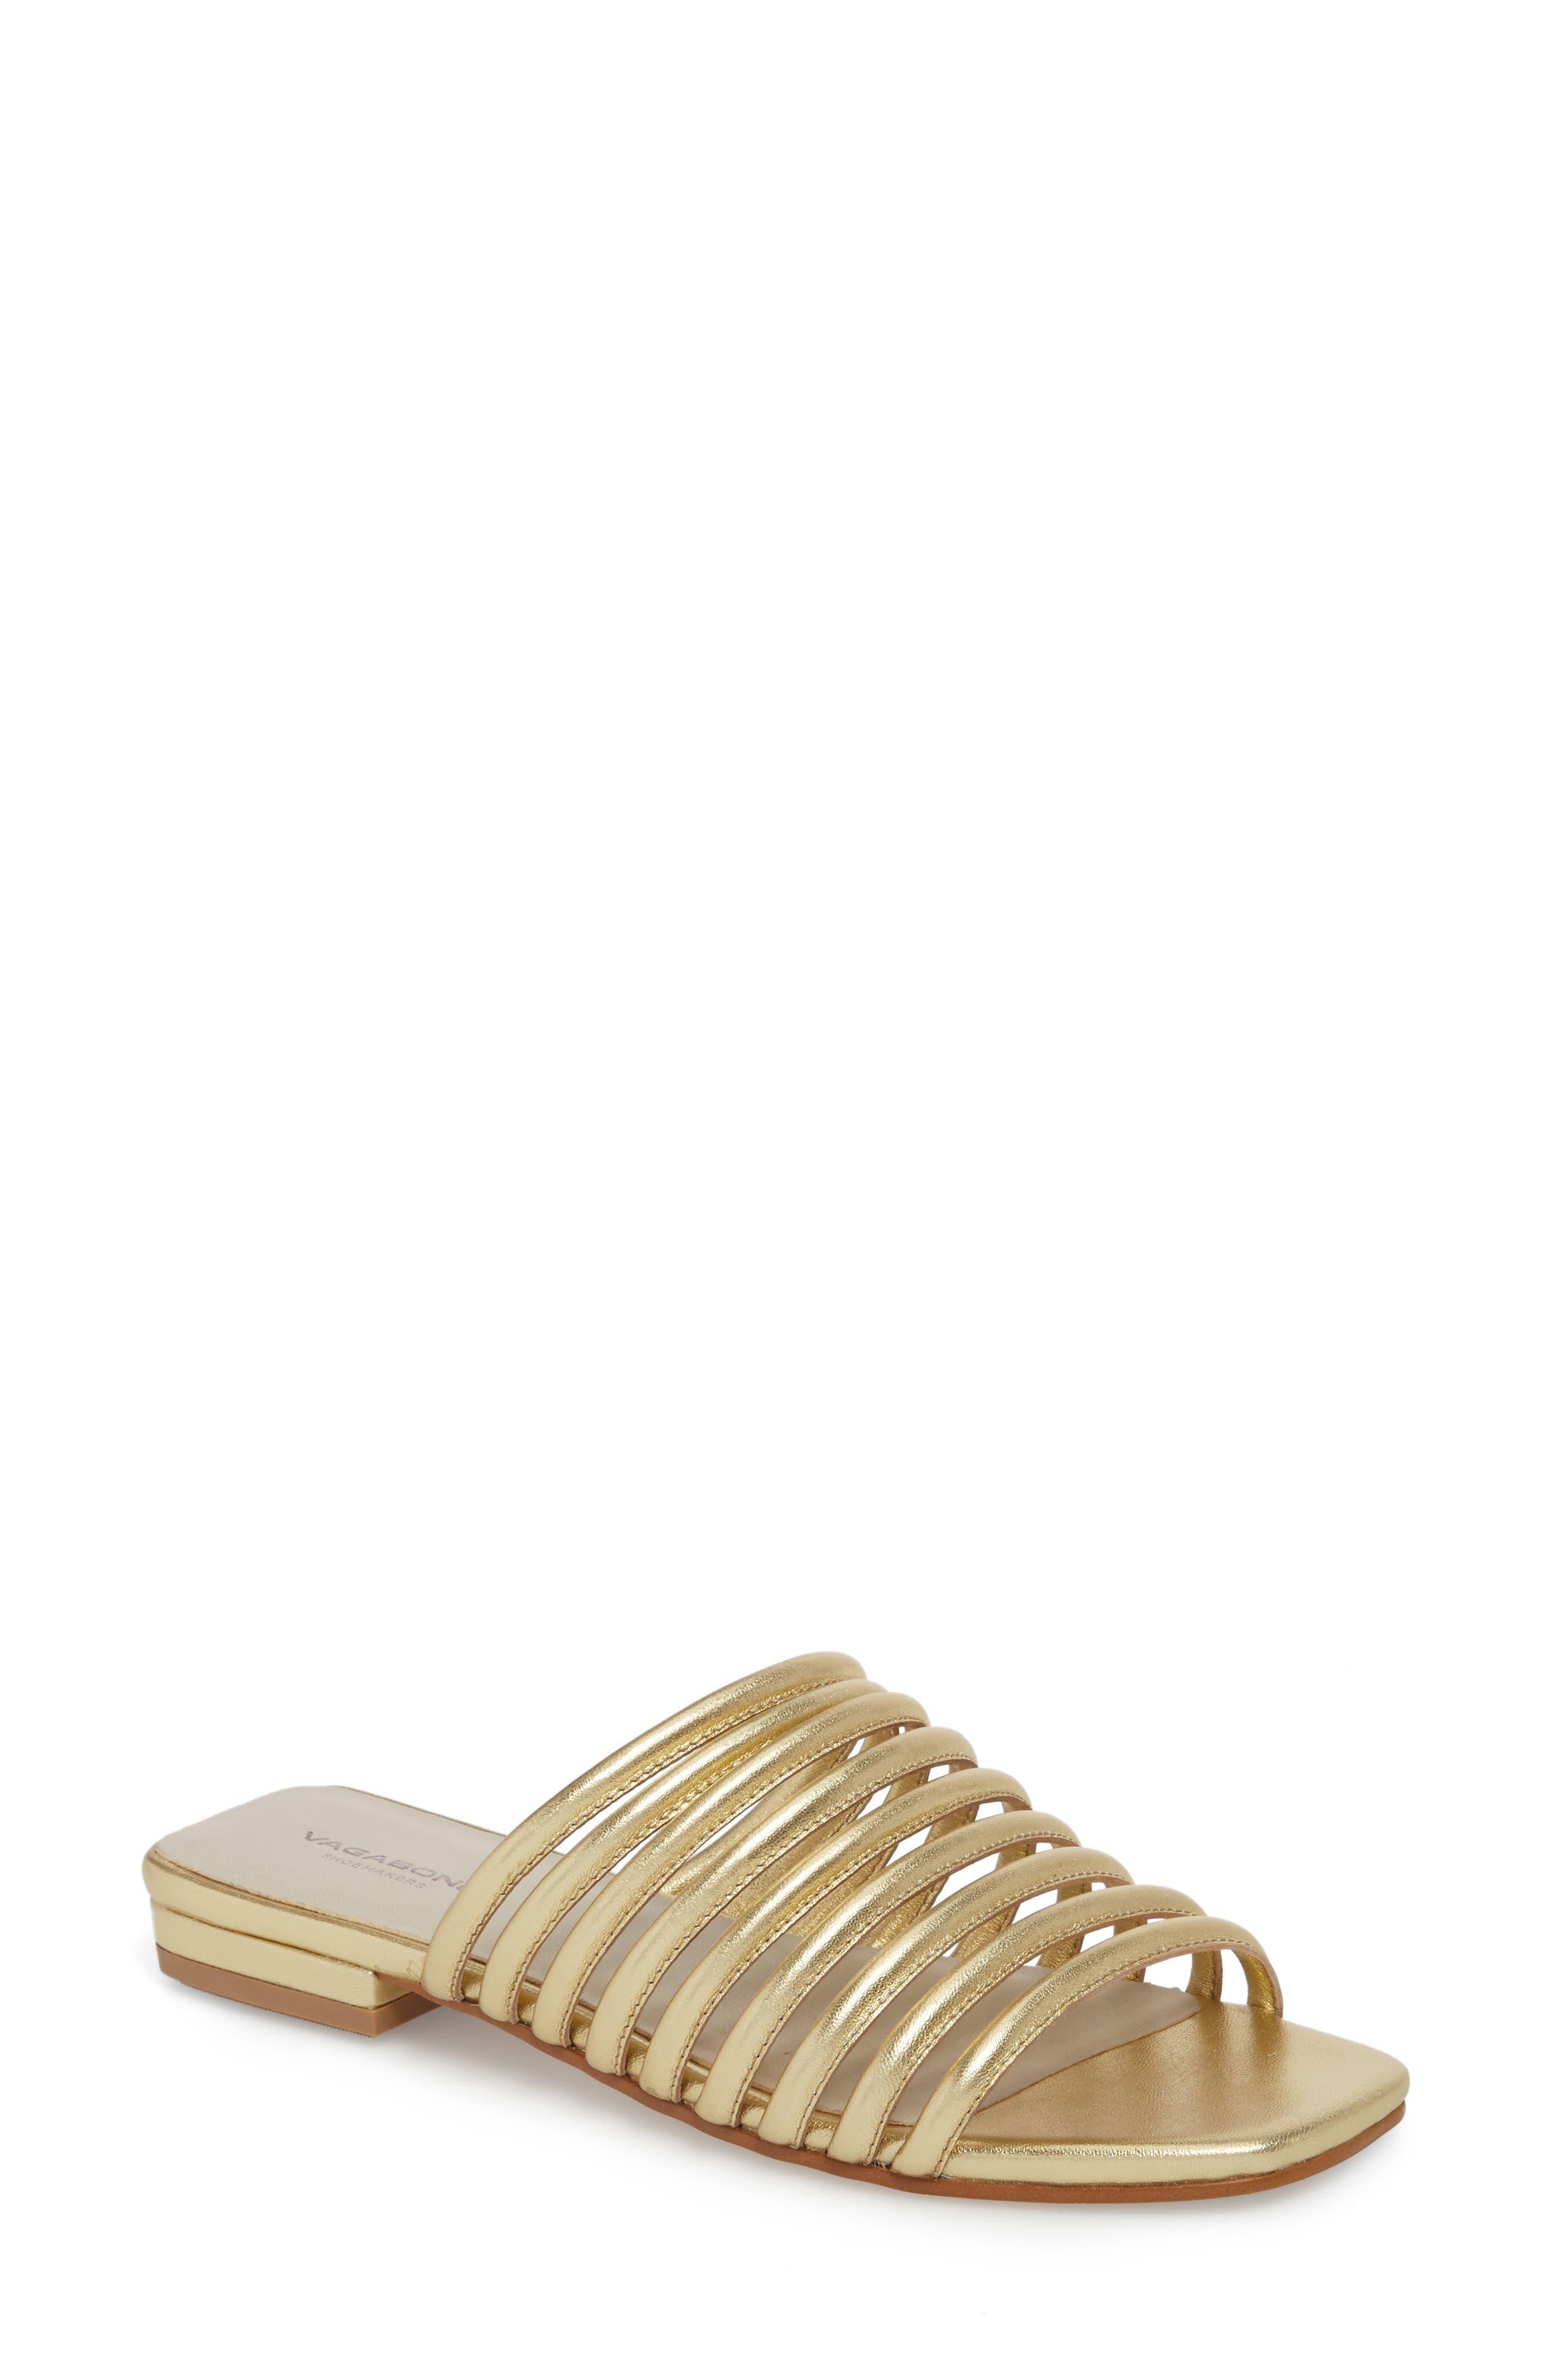 Vagabond Shoemakers Becky Slide Sandal, Metallic